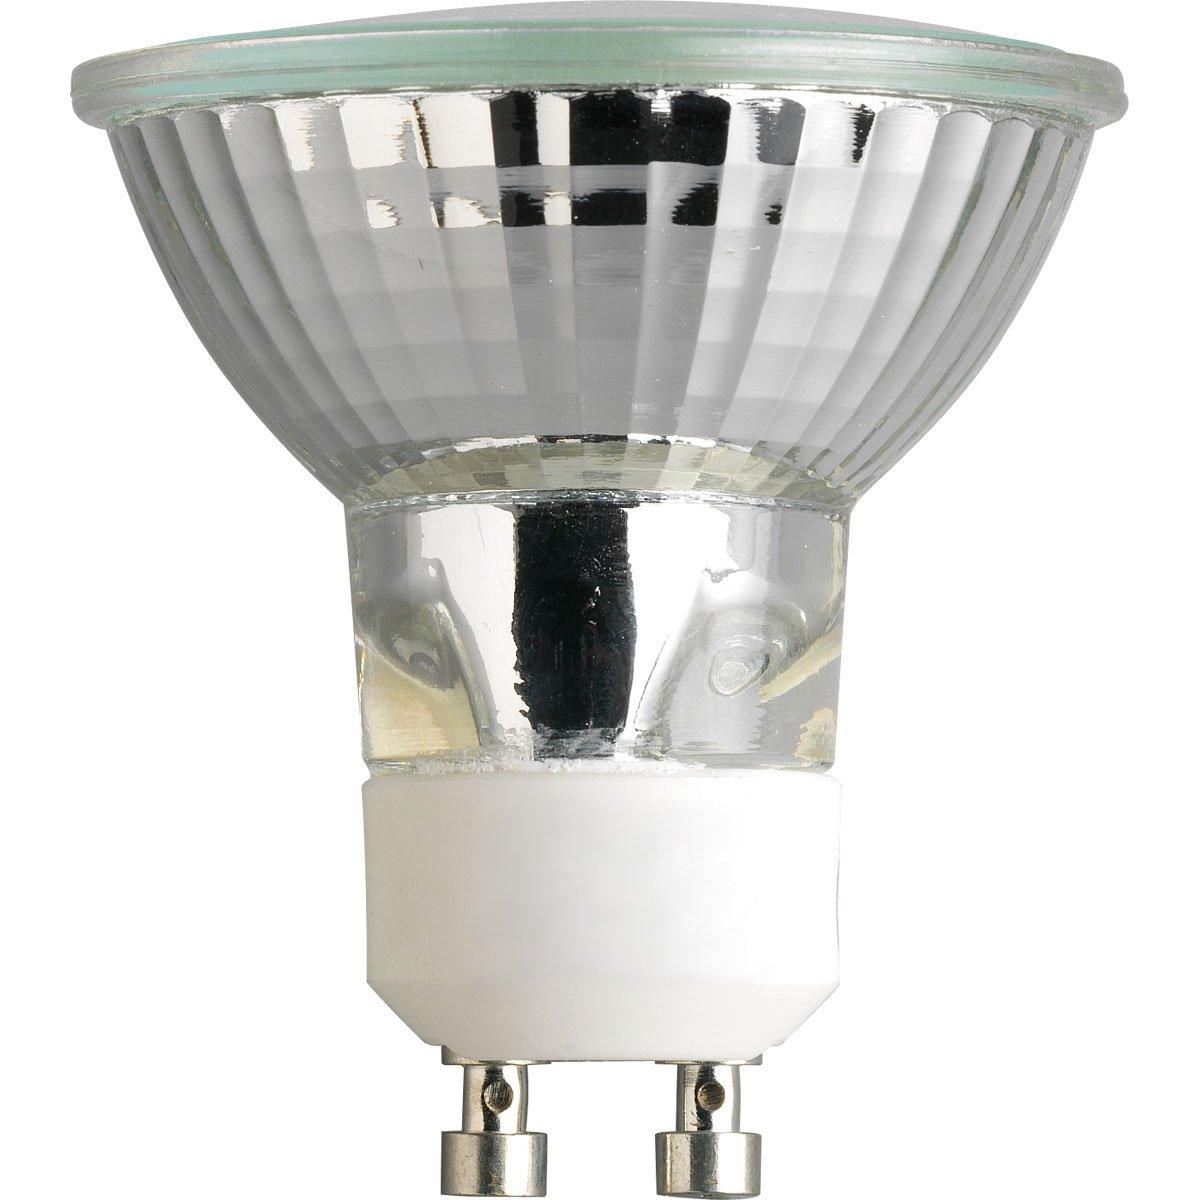 Progress Lighting P7834 01 50 watt MR16 Gu10 MFL Coated Lamp Eliminates Pink Color Behind Lamp